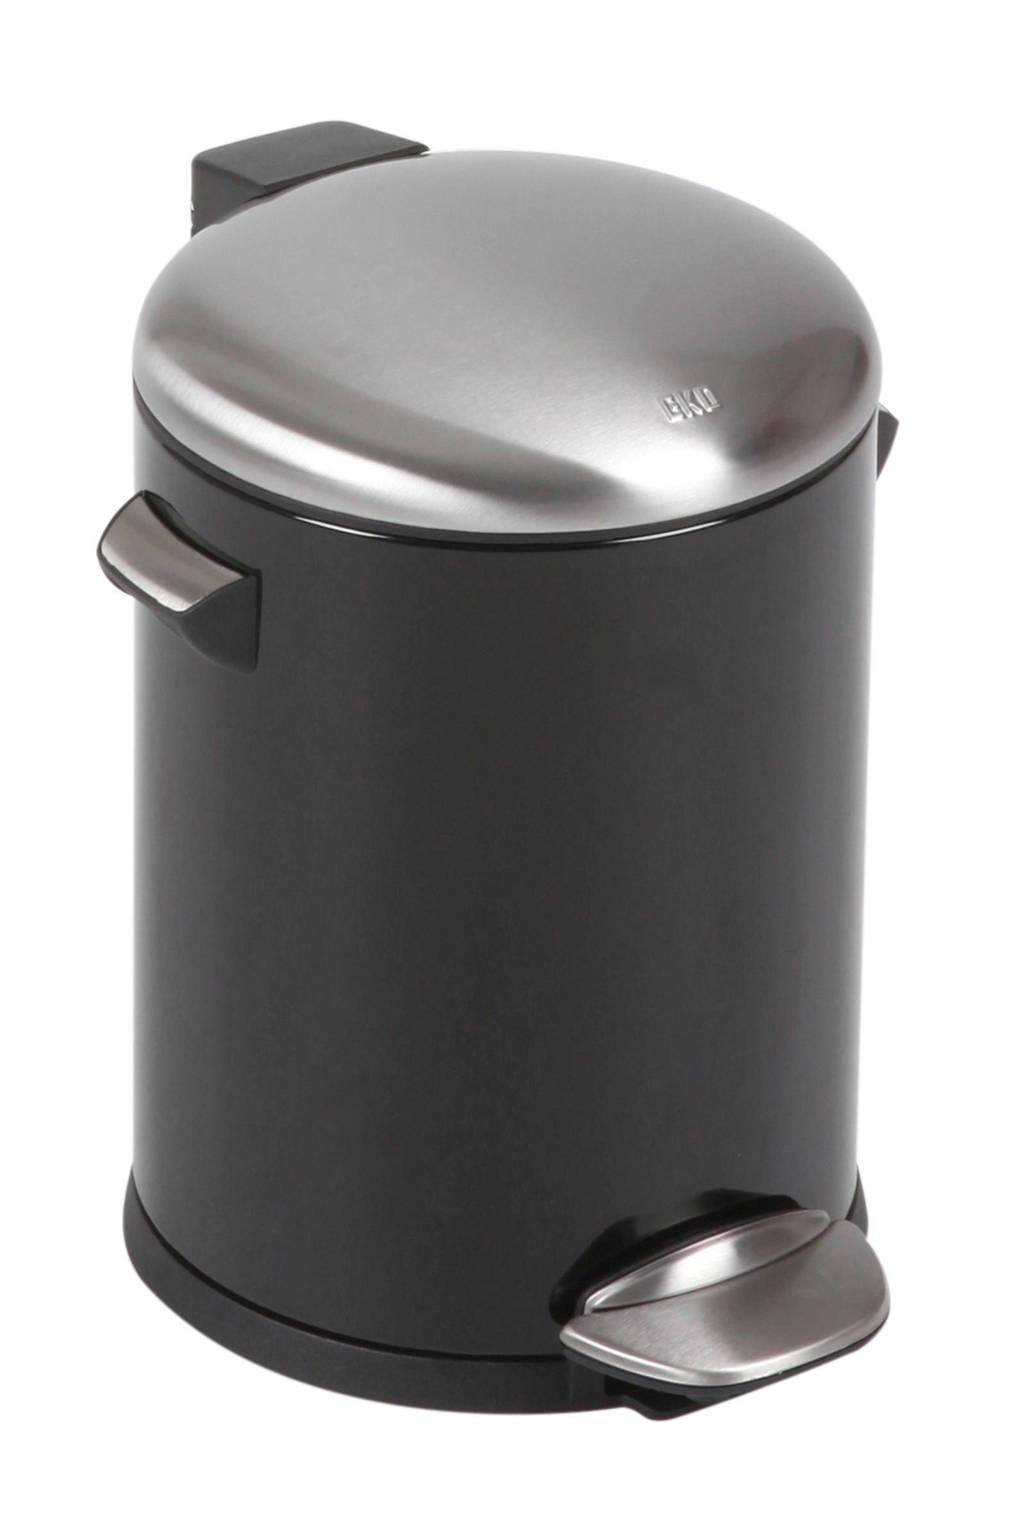 EKO Belle Deluxe 5 liter pedaalemmer, Zwart